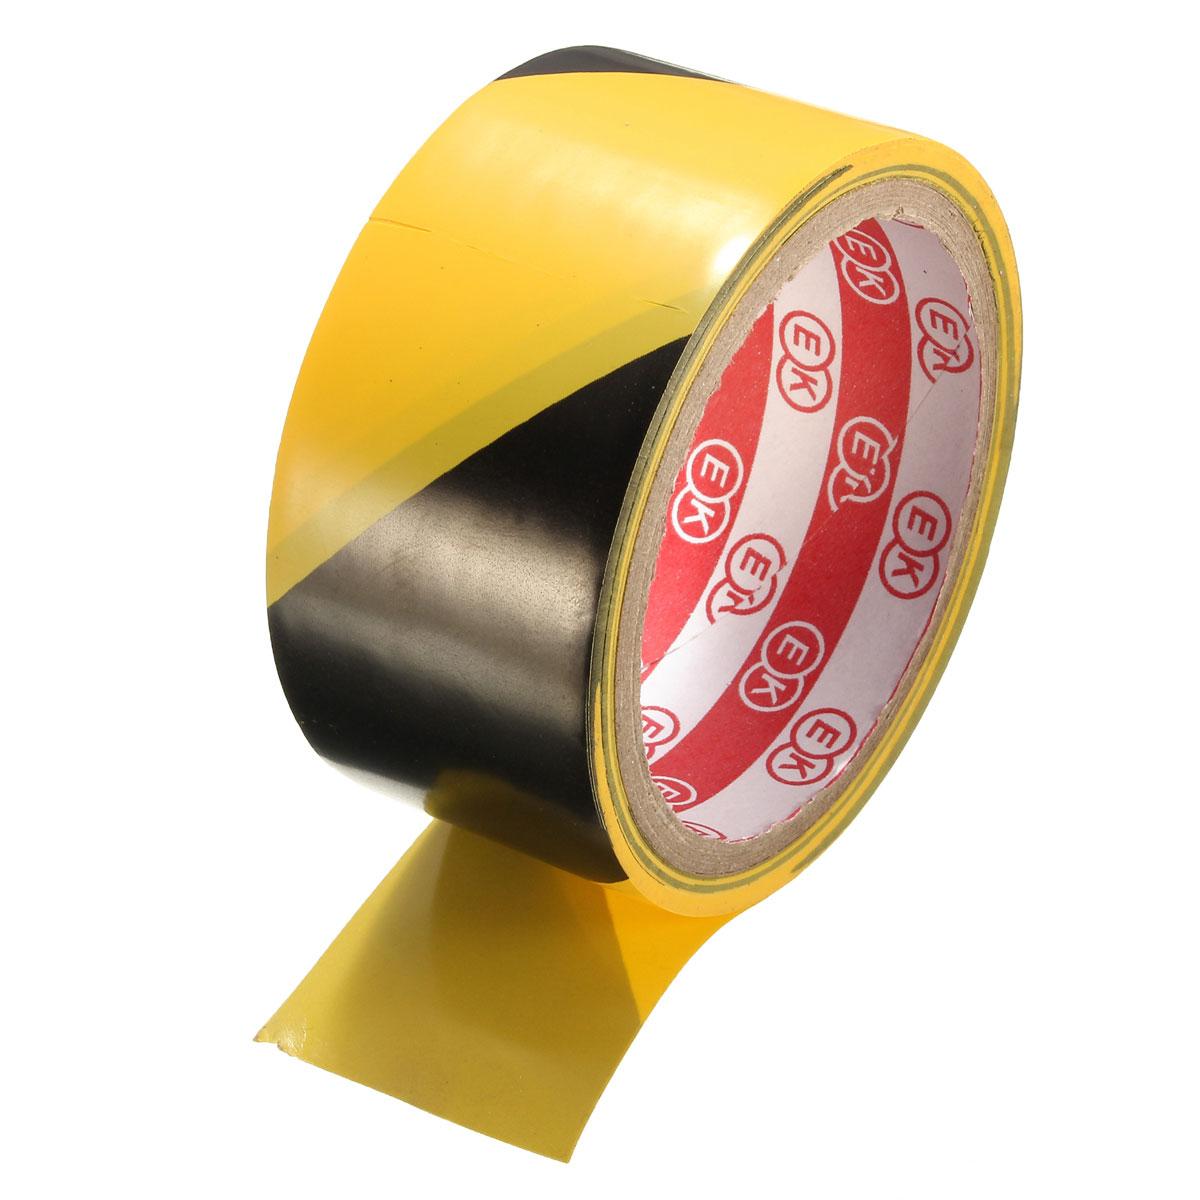 45mm Black and Yellow Self Adhesive Hazard Warning Safety Tape Marking Safety Car Warning Sticker